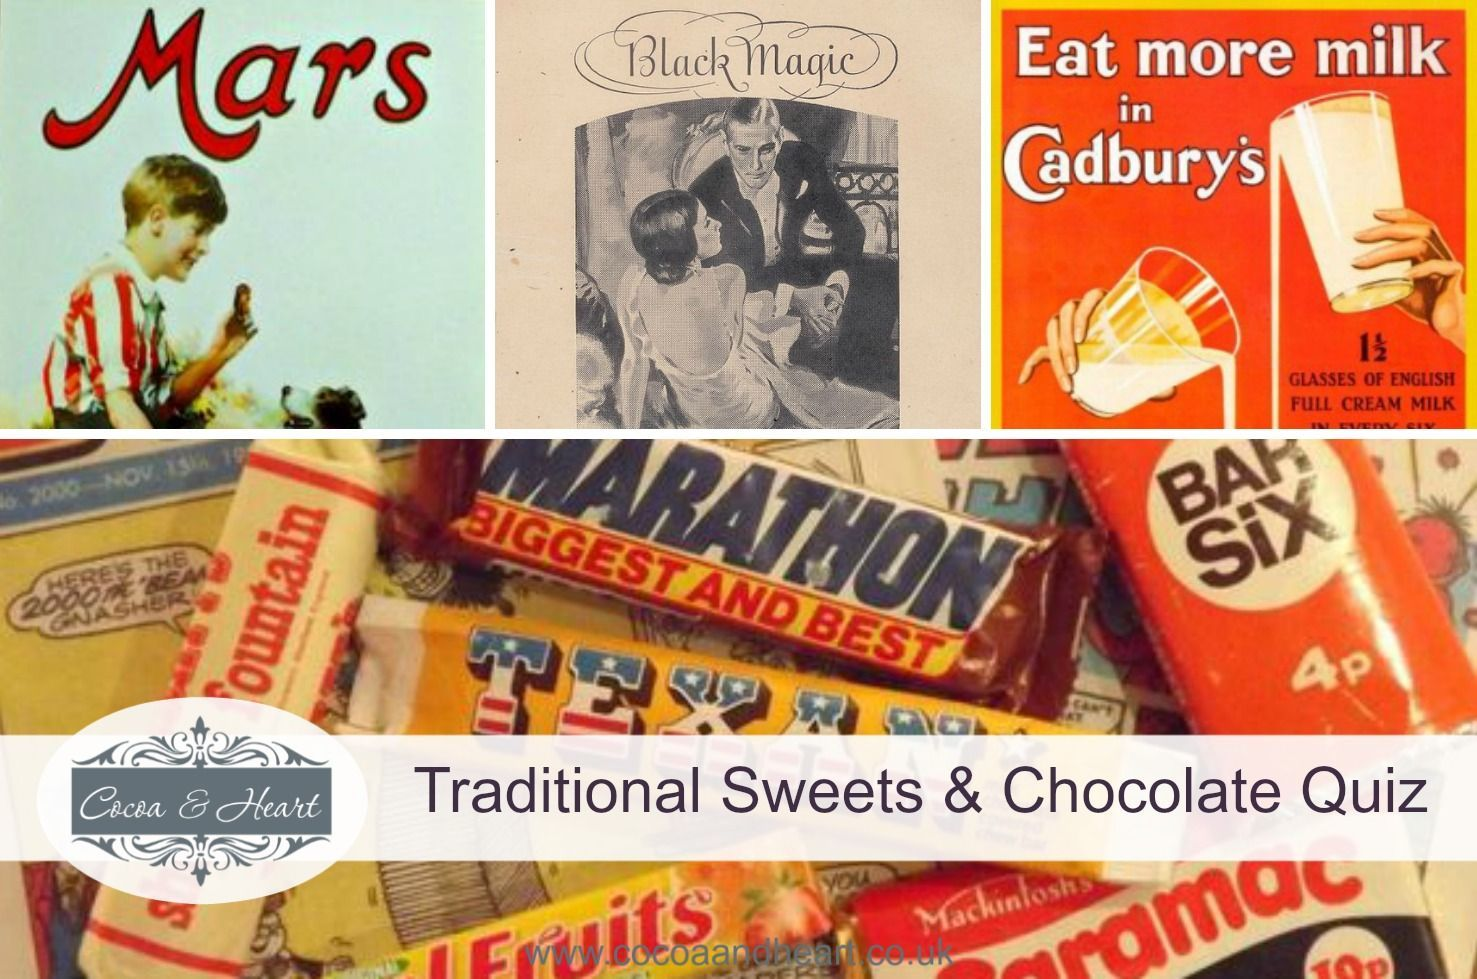 Traditonal Sweets & Chocolate Quiz